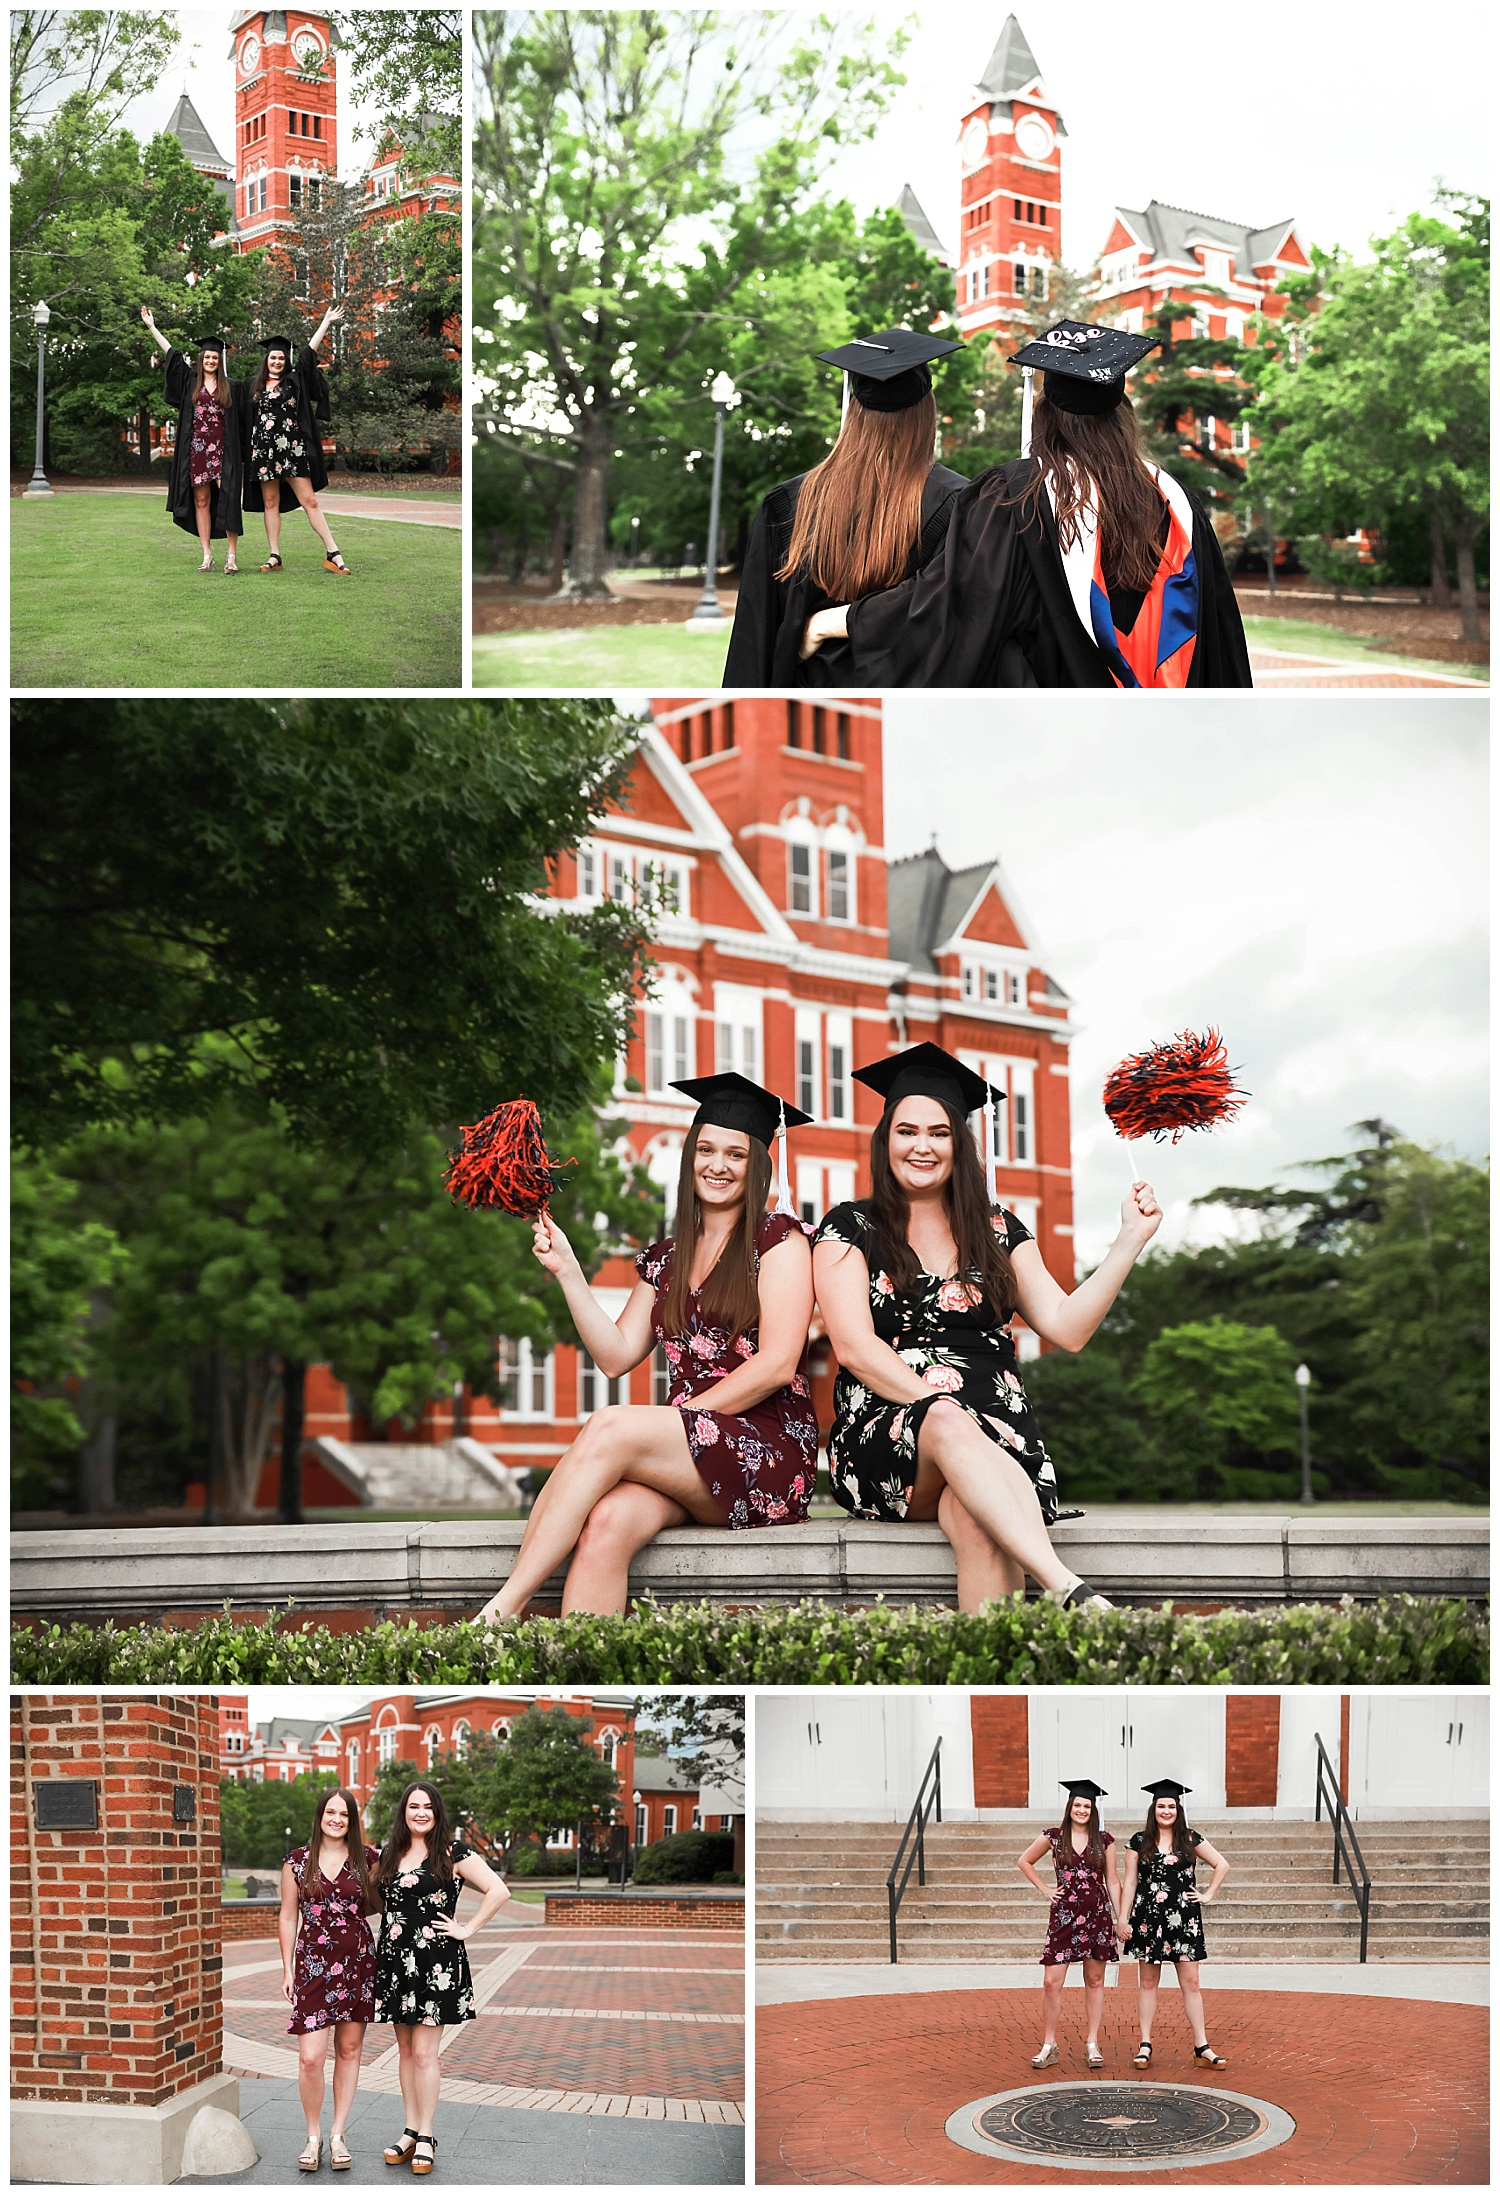 Ariel & Ashlynn | Class of 2019 | Auburn University